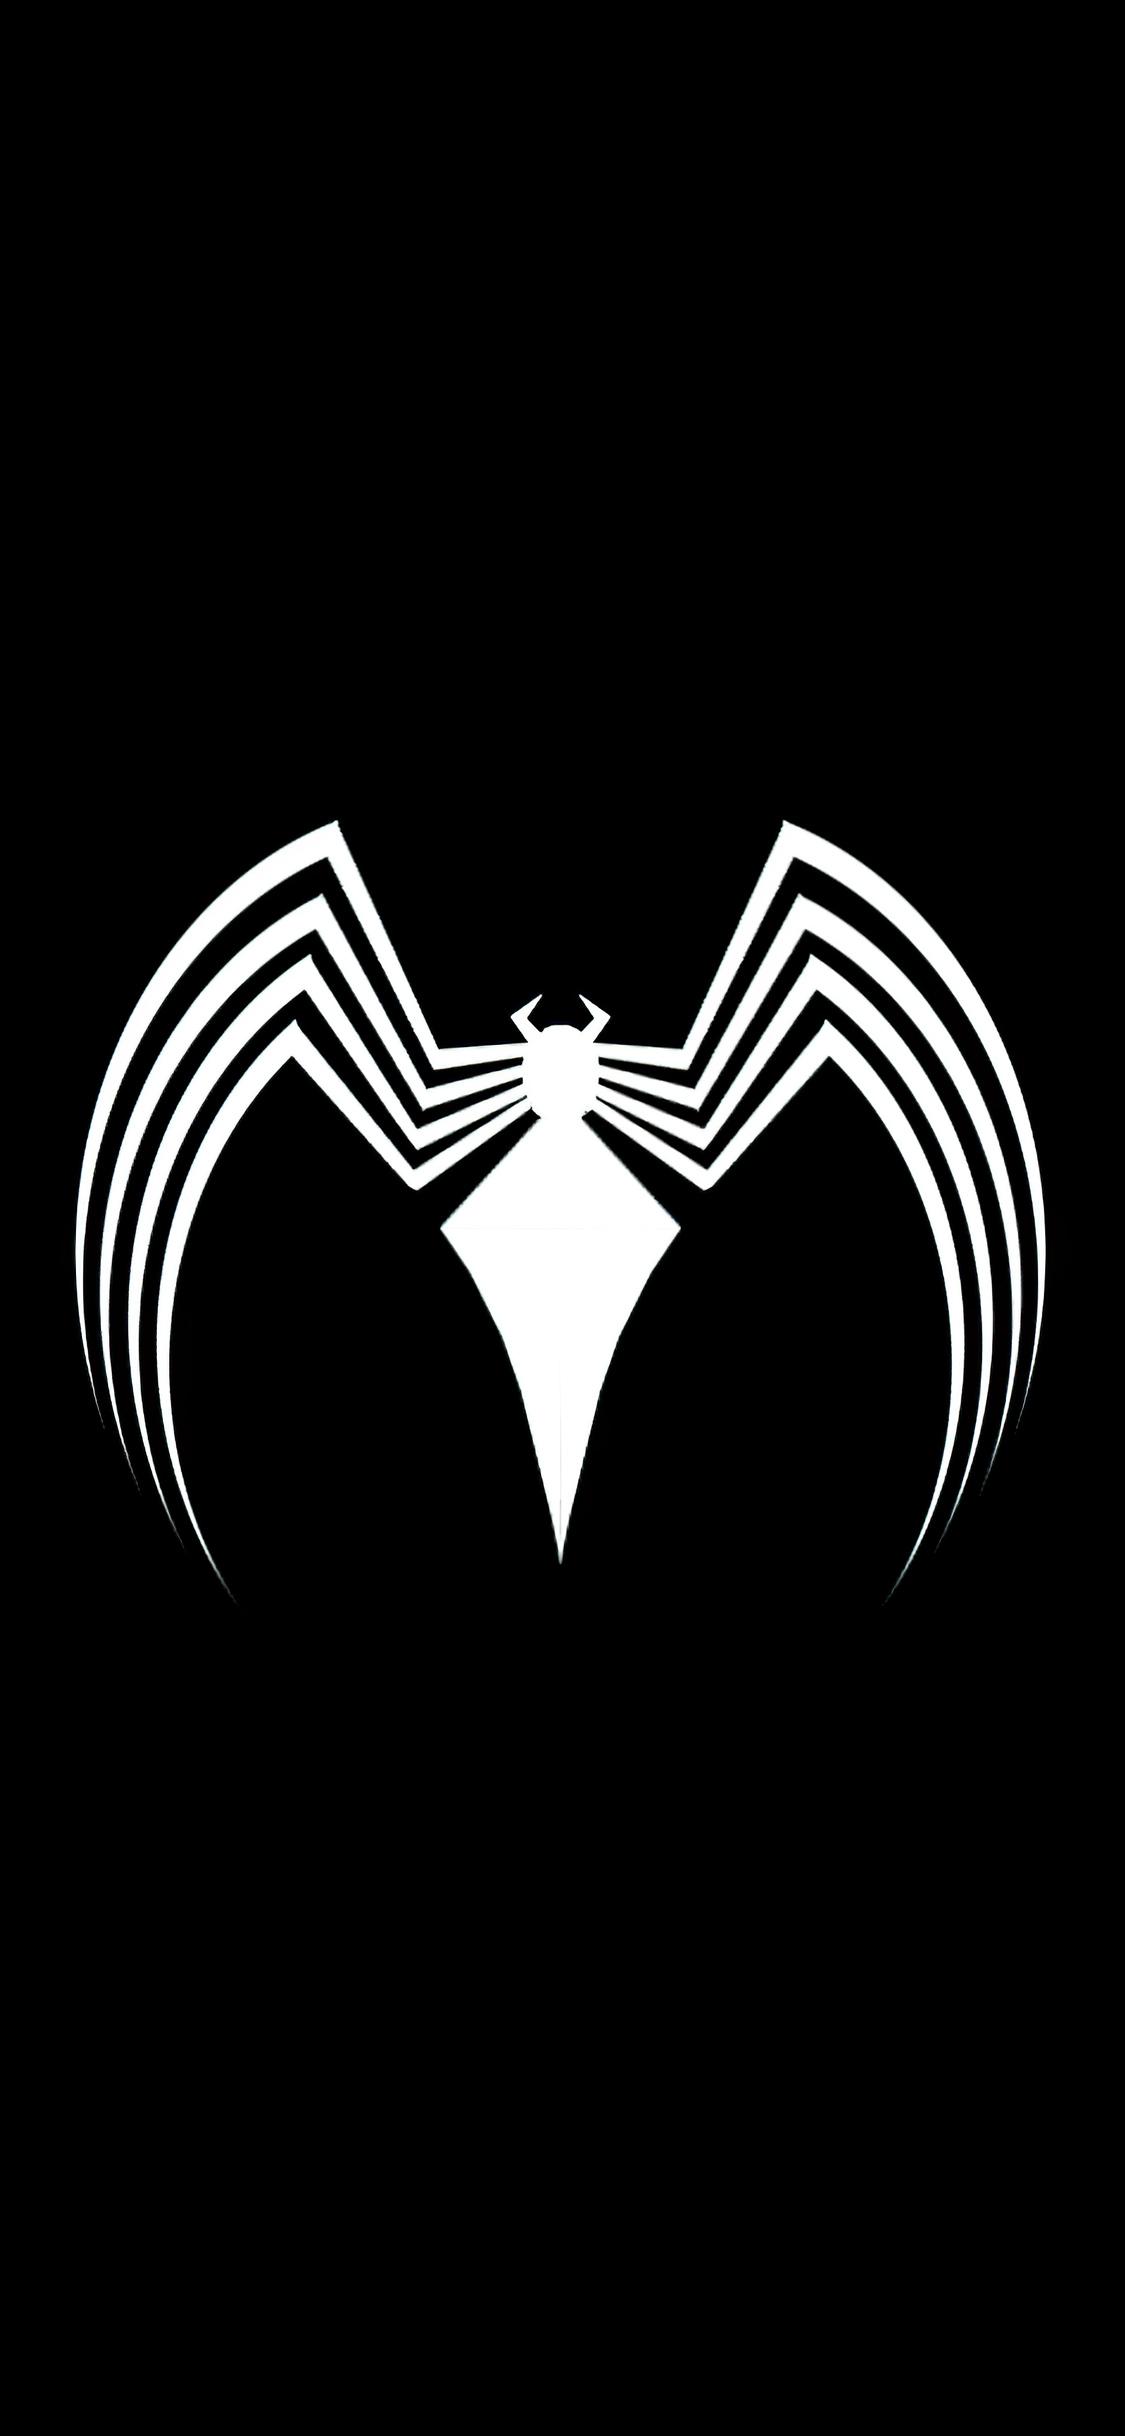 1125x2436 Venom Logo Dark 4k Iphone XS,Iphone 10,Iphone X ...